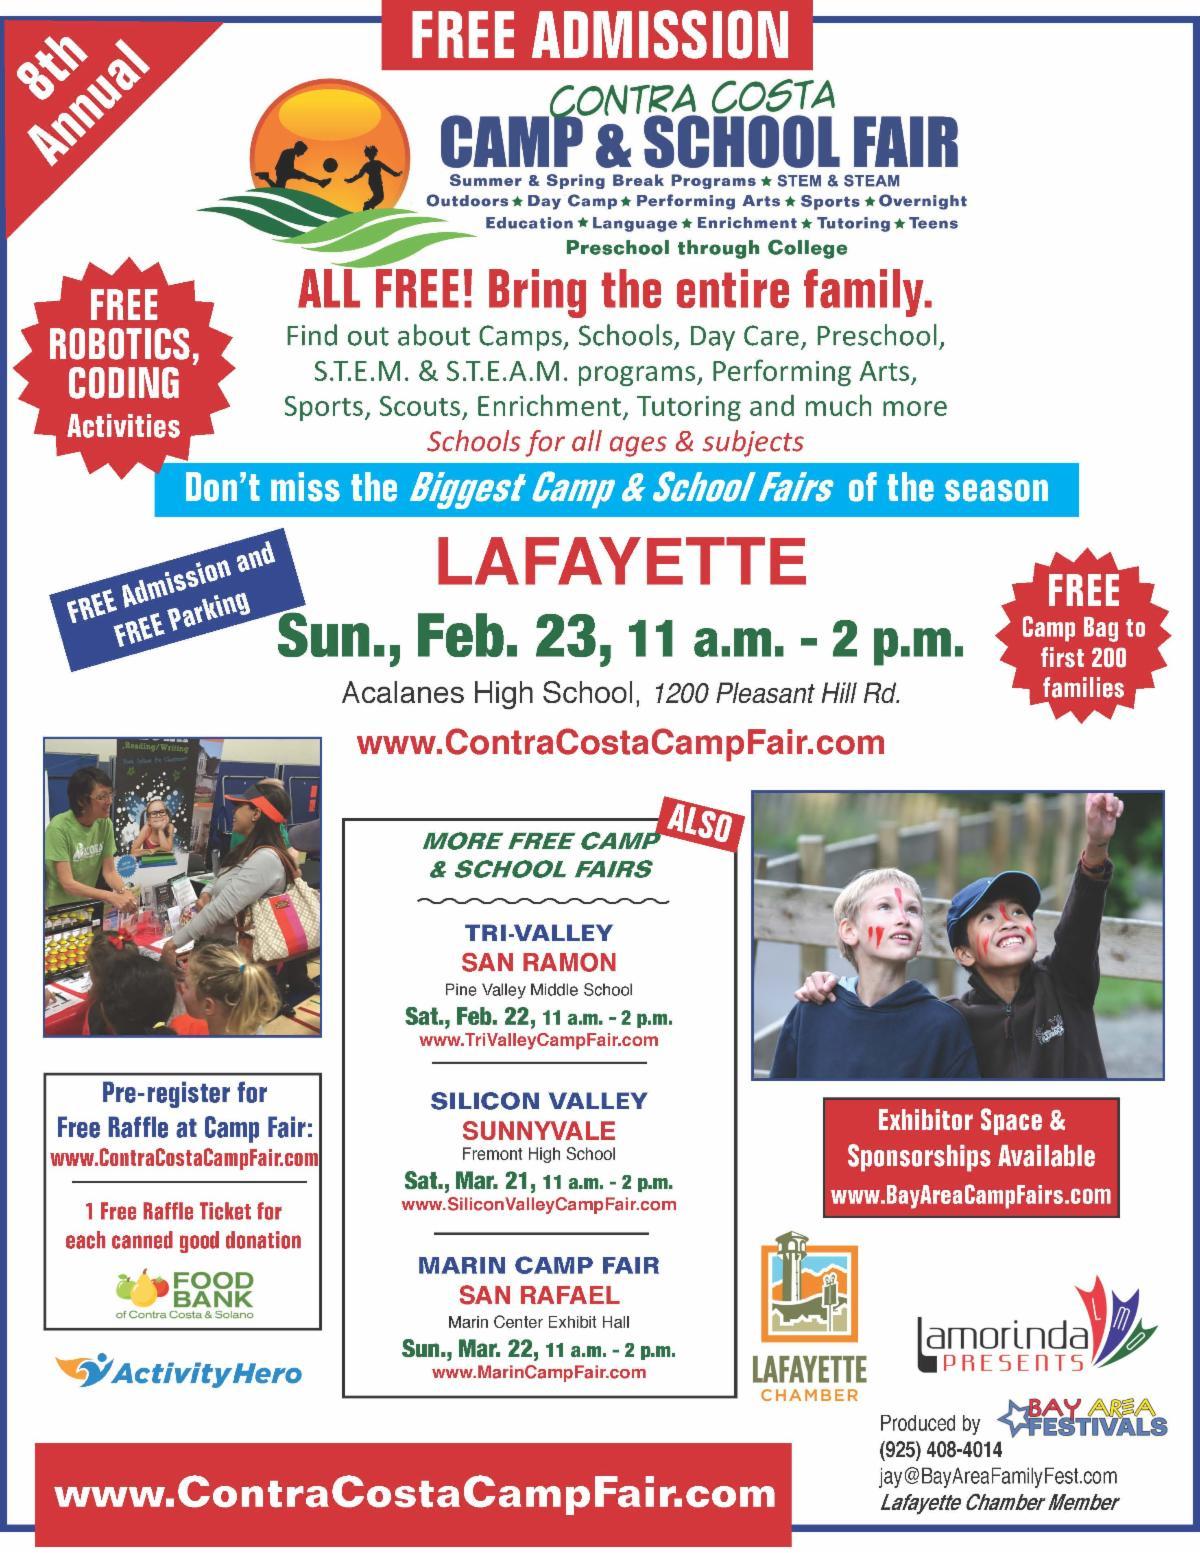 Contra Costa Camp & School Fair